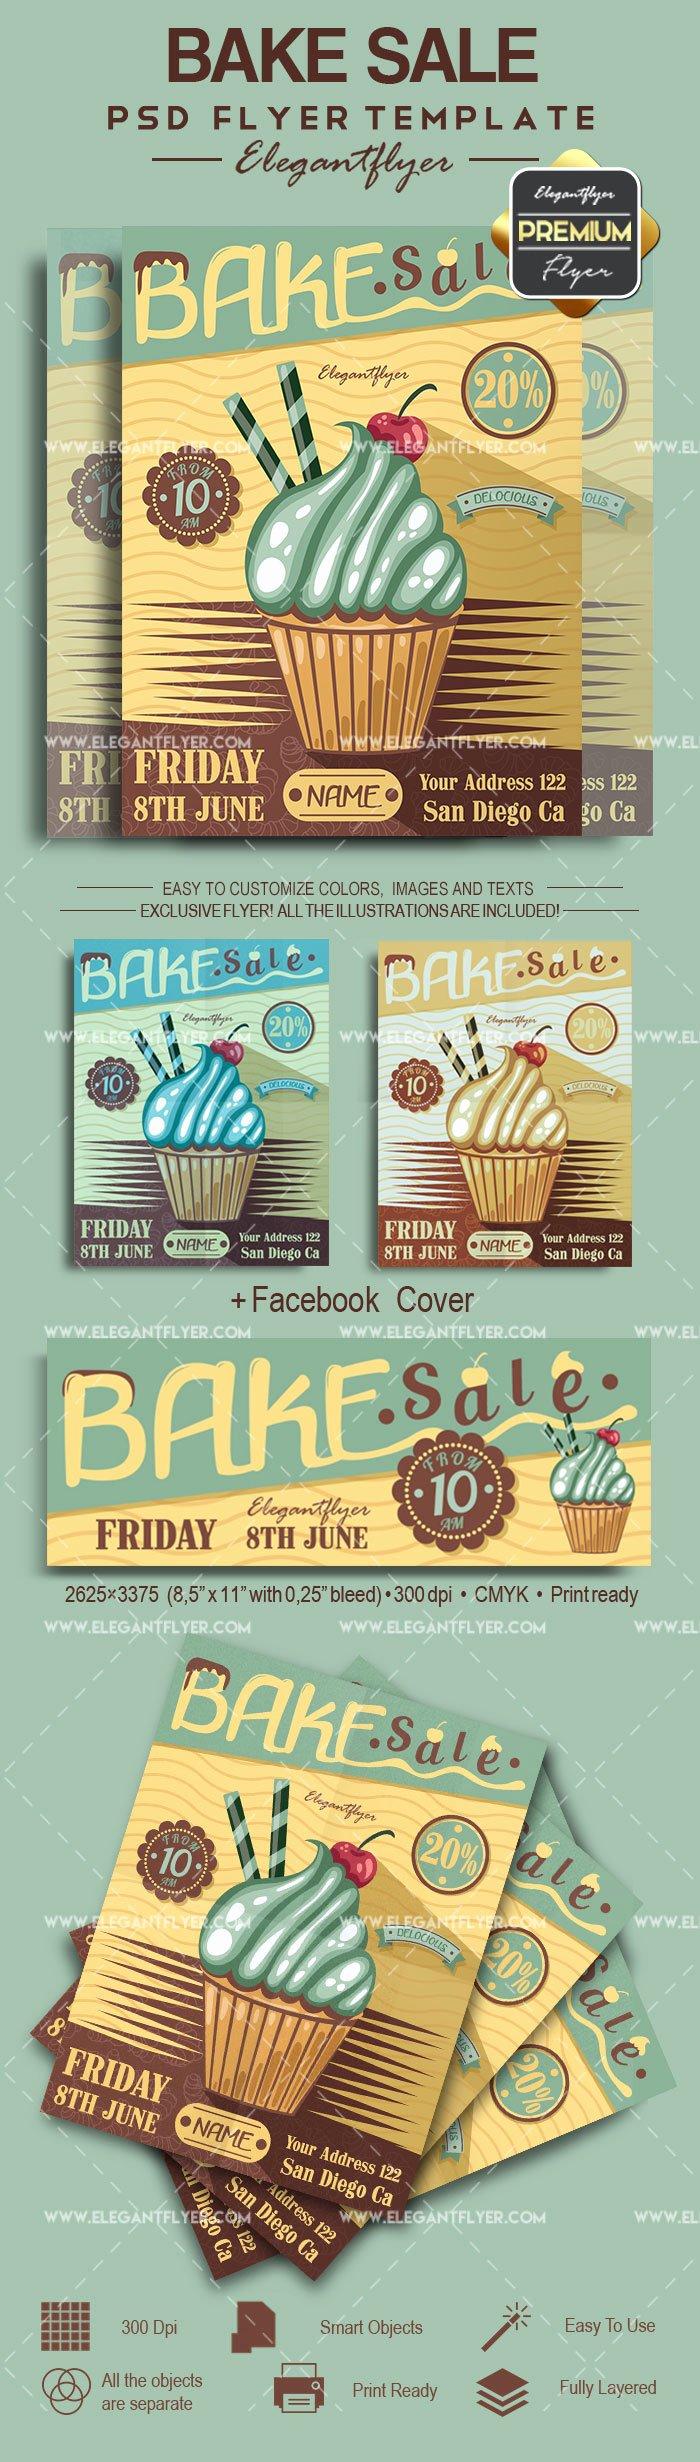 Bake Sale Psd Poster – by Elegantflyer